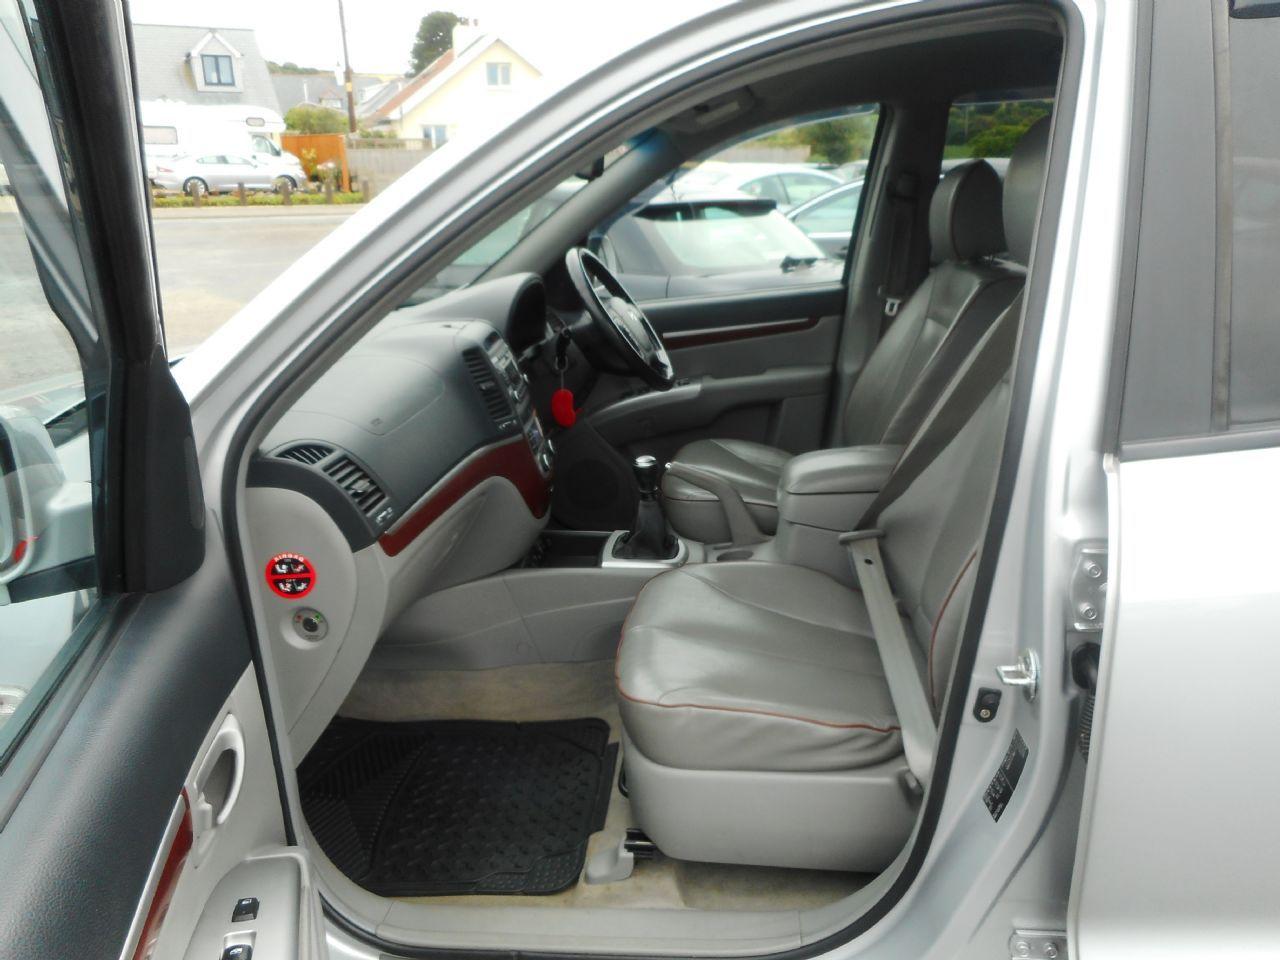 HYUNDAI Santa Fe 2.2 CRTD CDX 5 Seat EU4 (2008) - Picture 9